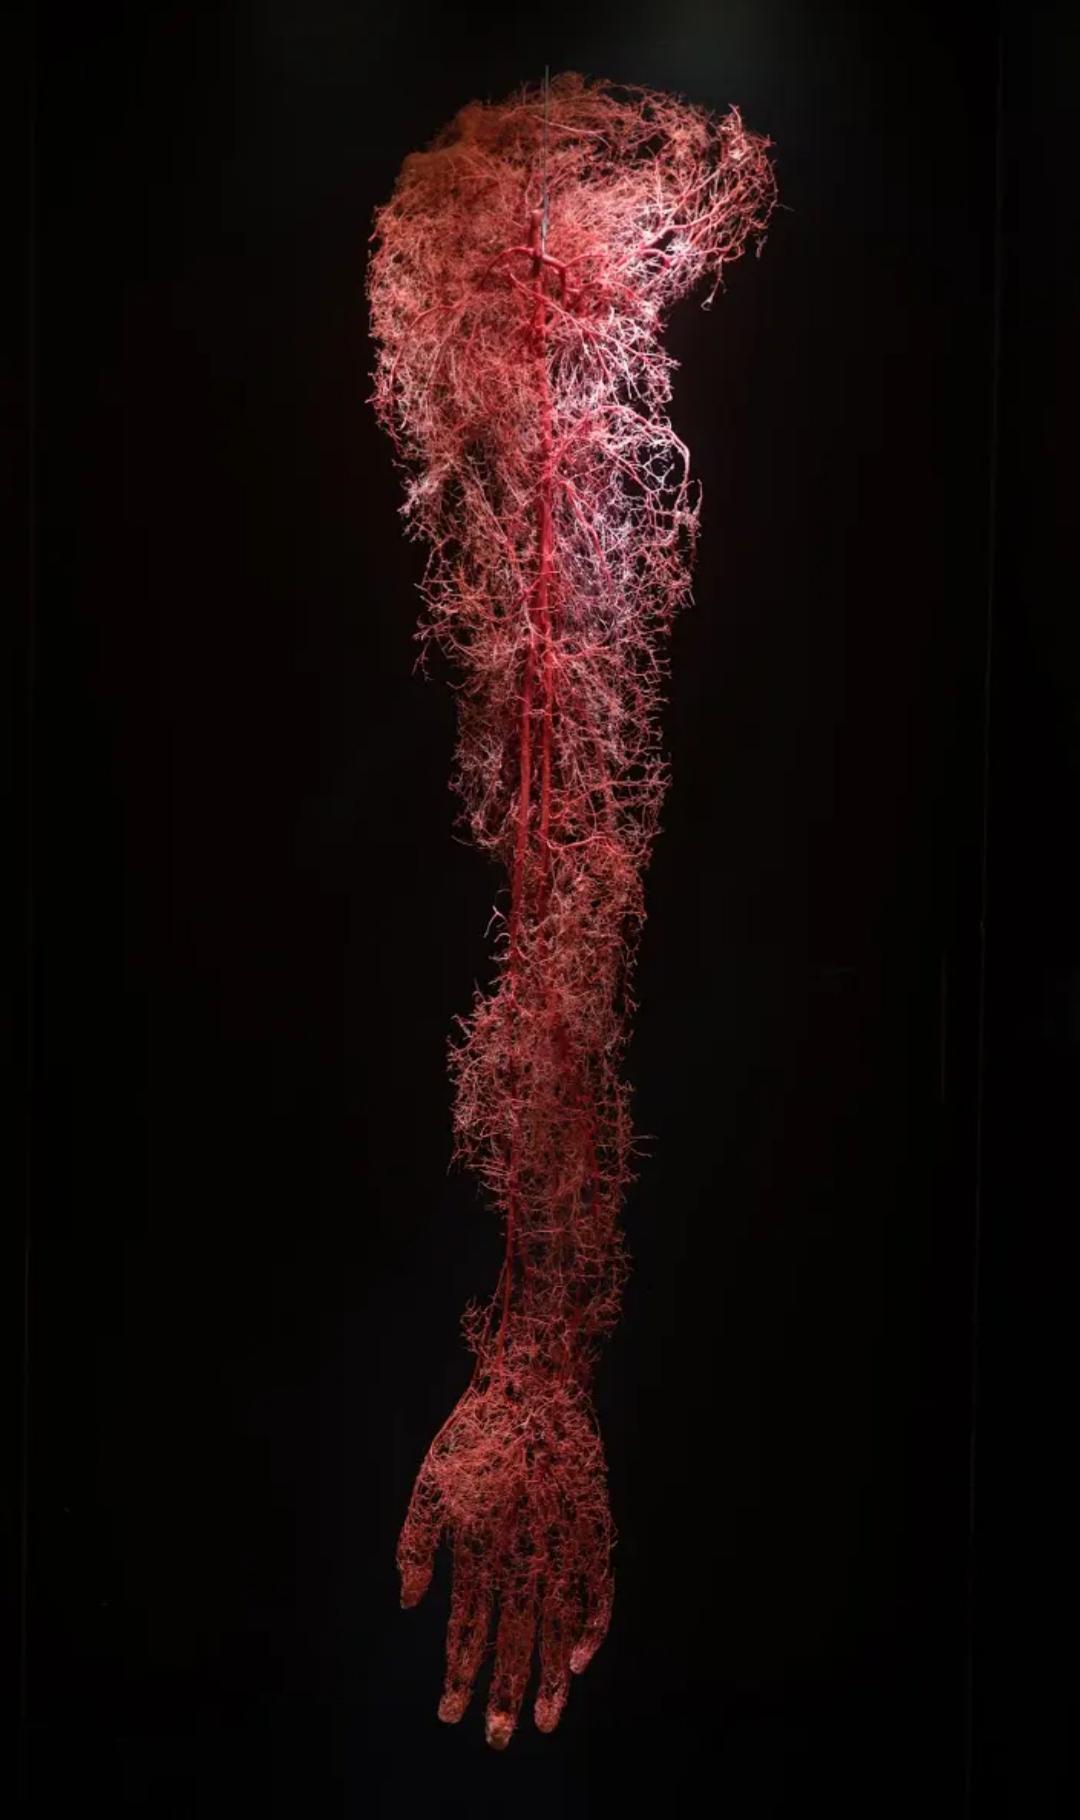 Circulatory system of a human arm